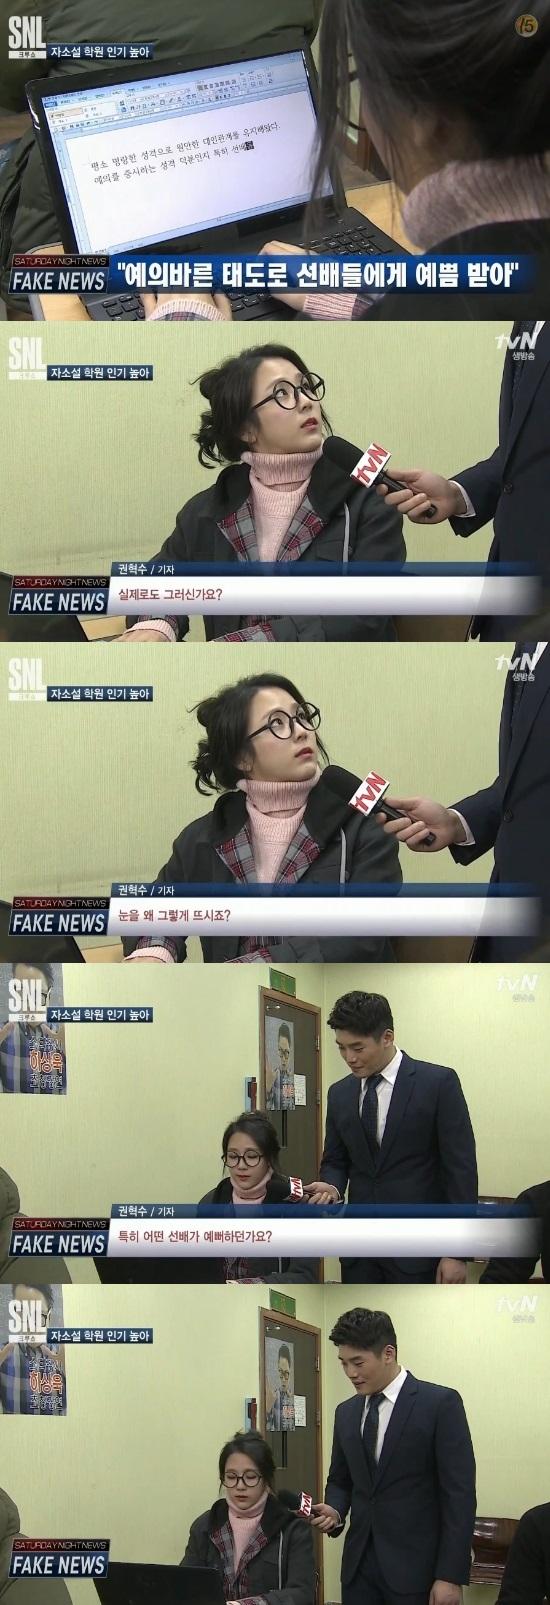 SNL 코리아 시즌7 예원 / 사진=tvN 'SNL 코리아 시즌7' 예원 캡처